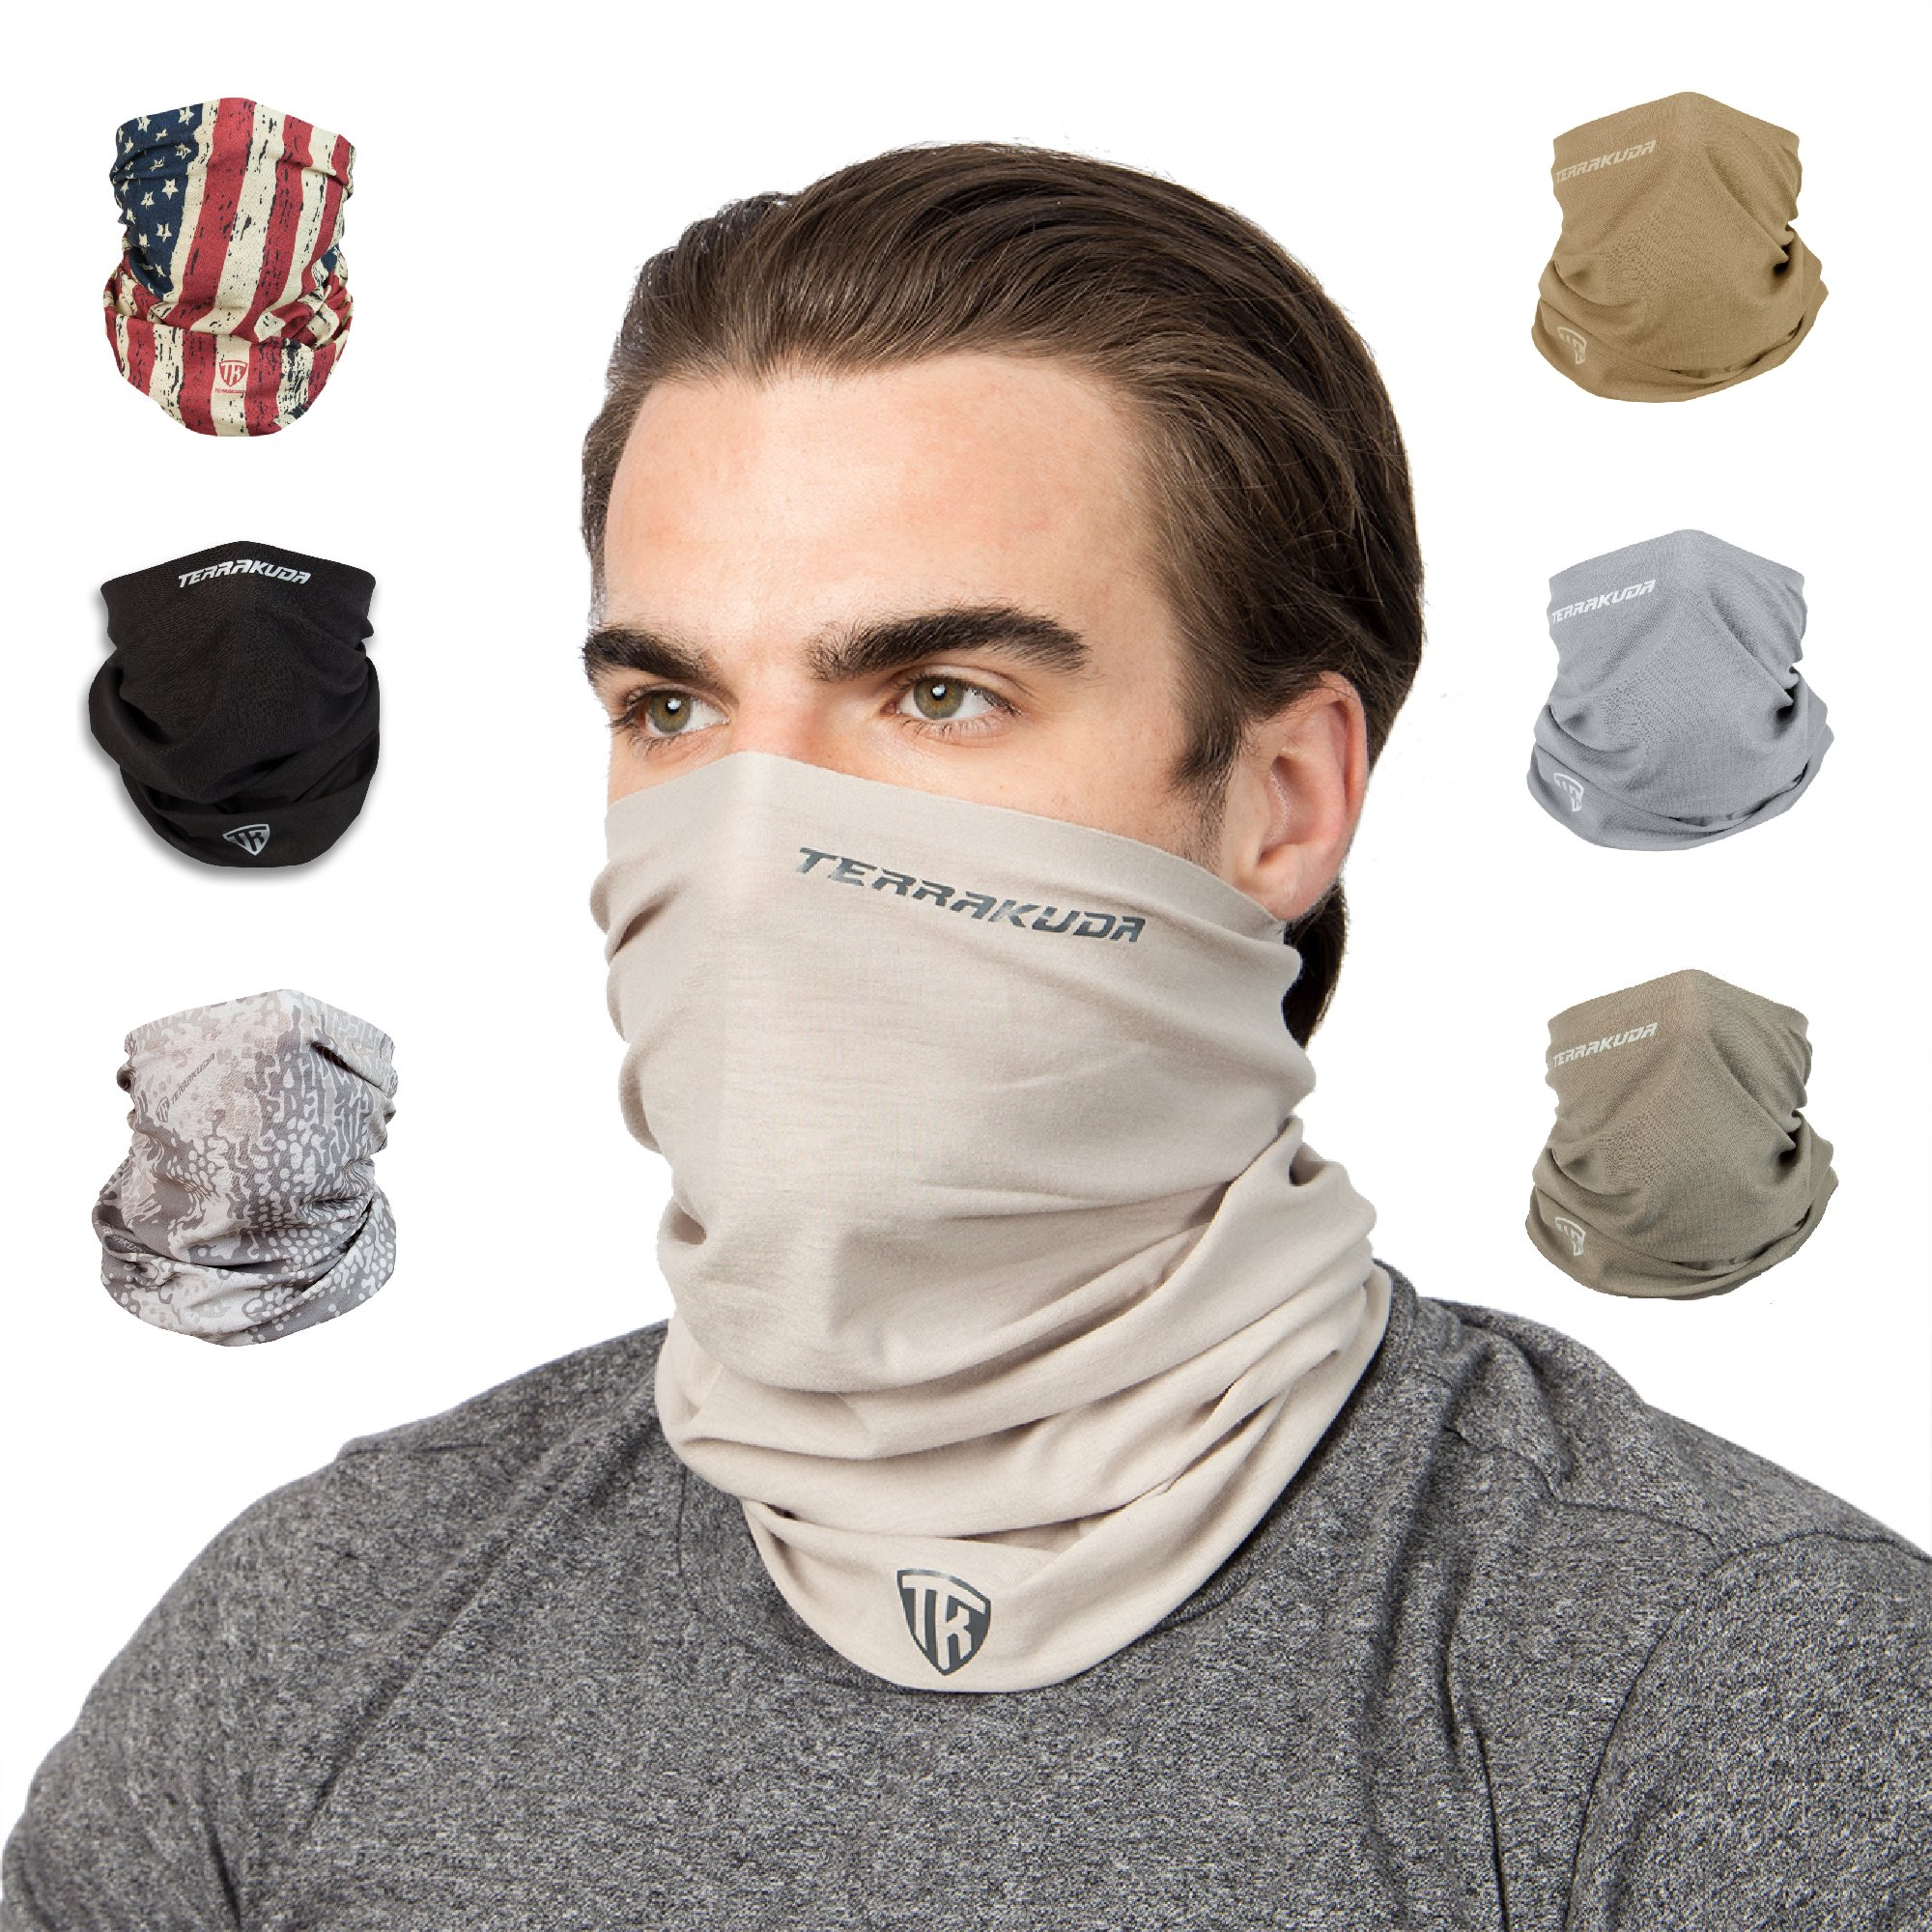 Terra Kuda Face Clothing Neck Gaiter Mask - Non Slip Light Breathable for Sun Wind Dust Bandana Balaclava (Desert Sand) by Terra Kuda